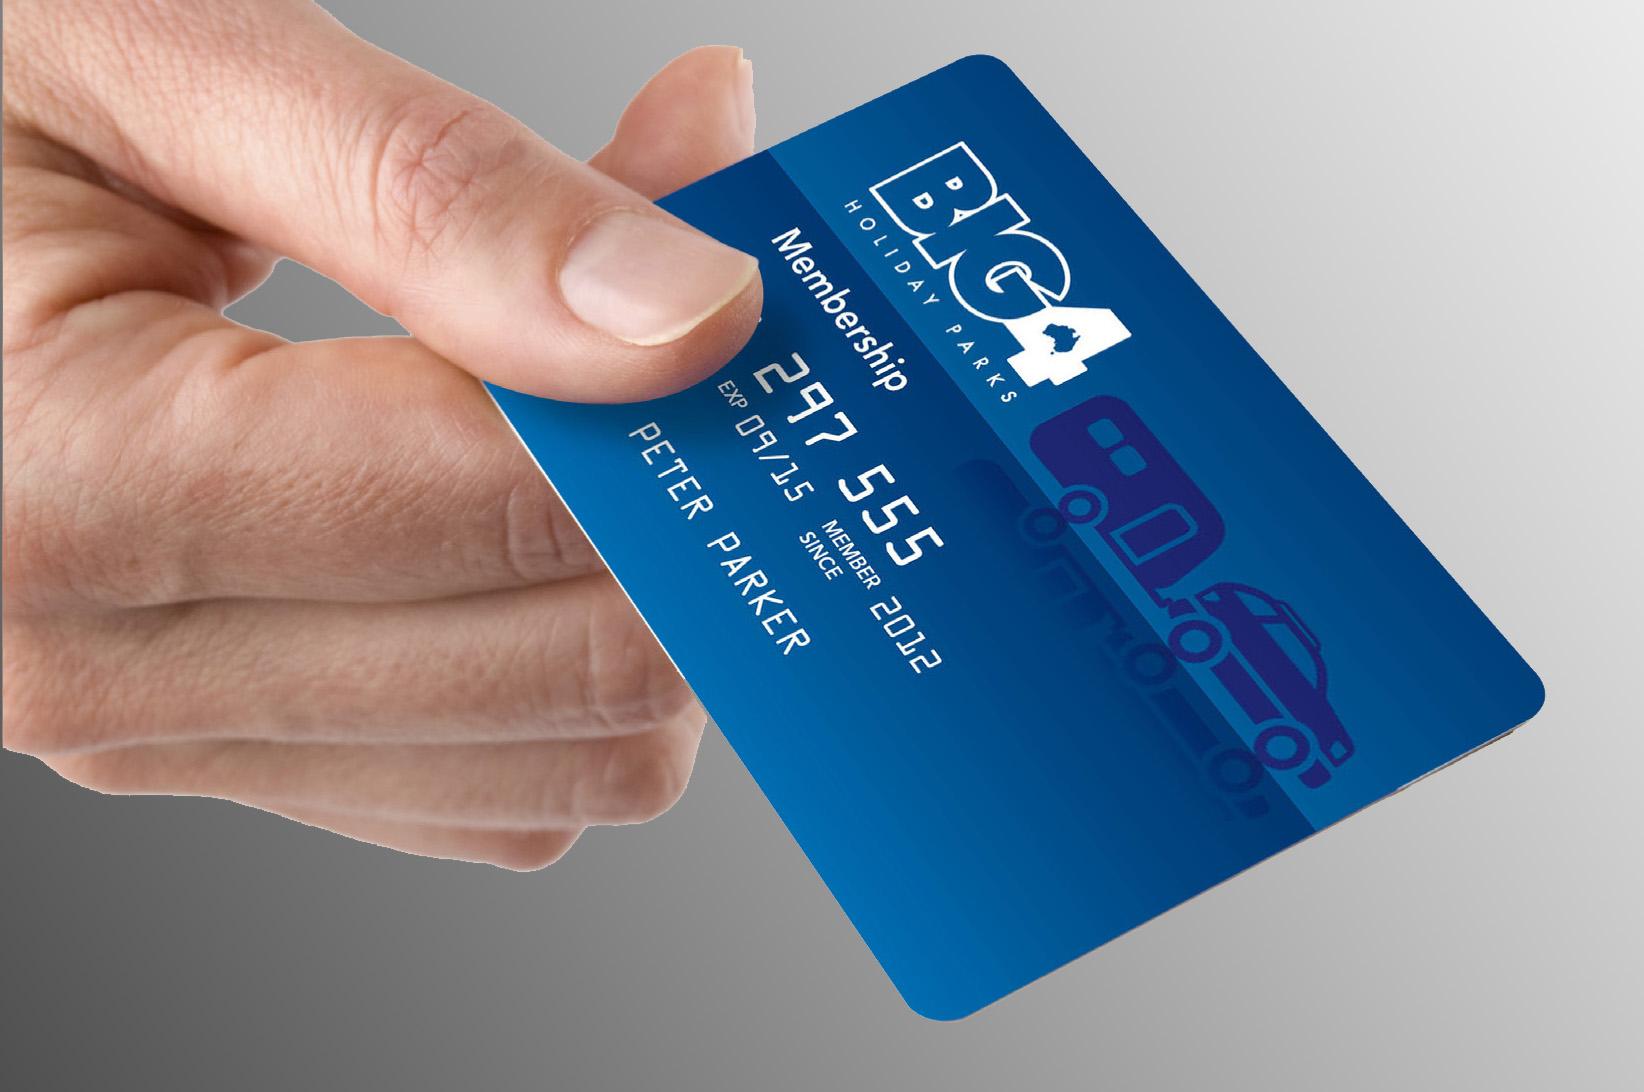 rebrand_blue_card_rgb.jpg